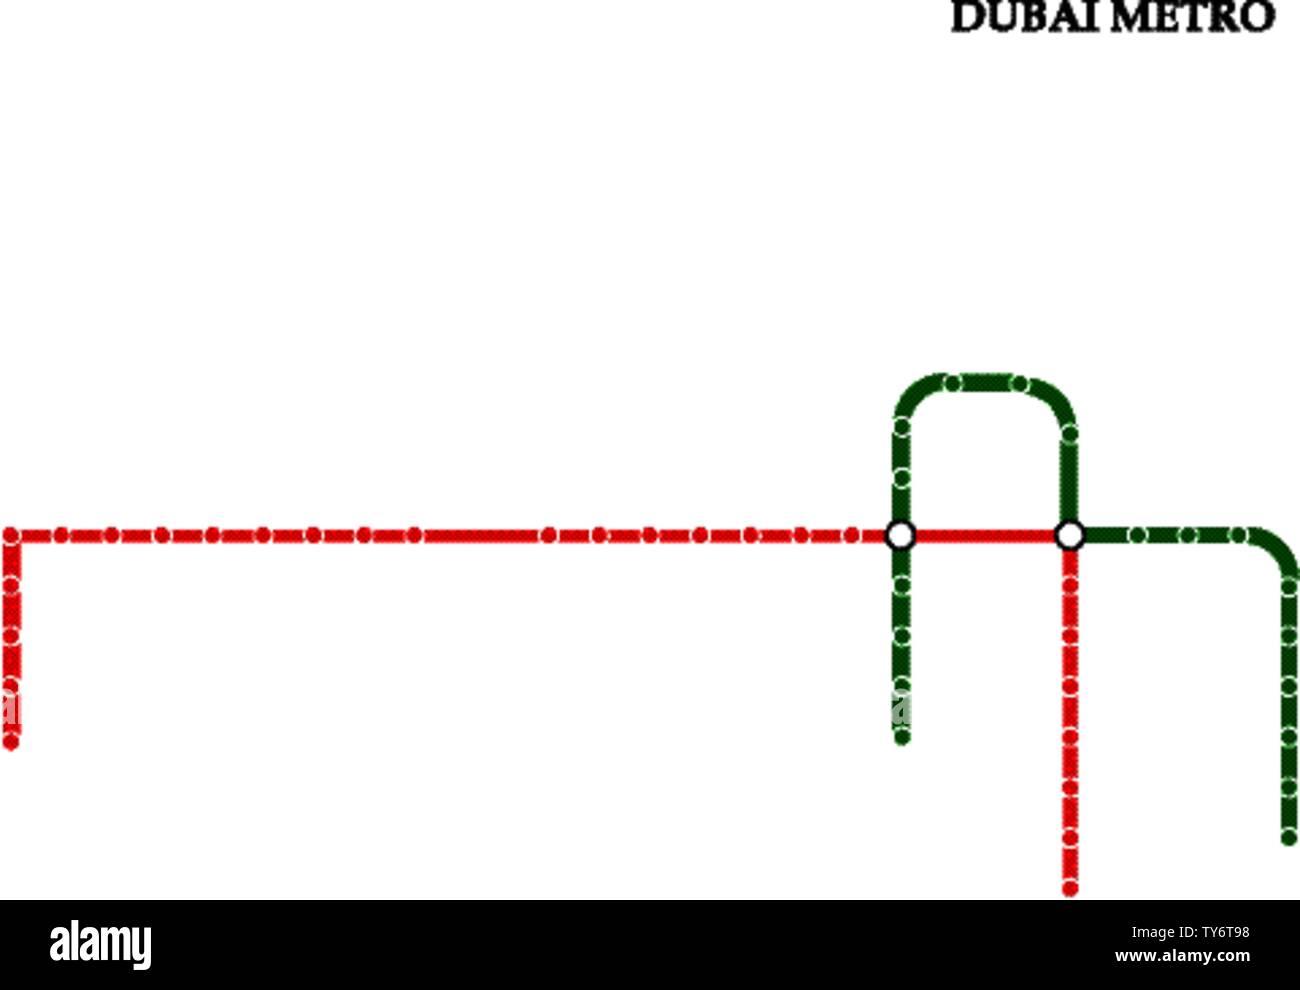 Dubai Subway Map.Dubai Metro Line Map Dubai Stock Photos Dubai Metro Line Map Dubai